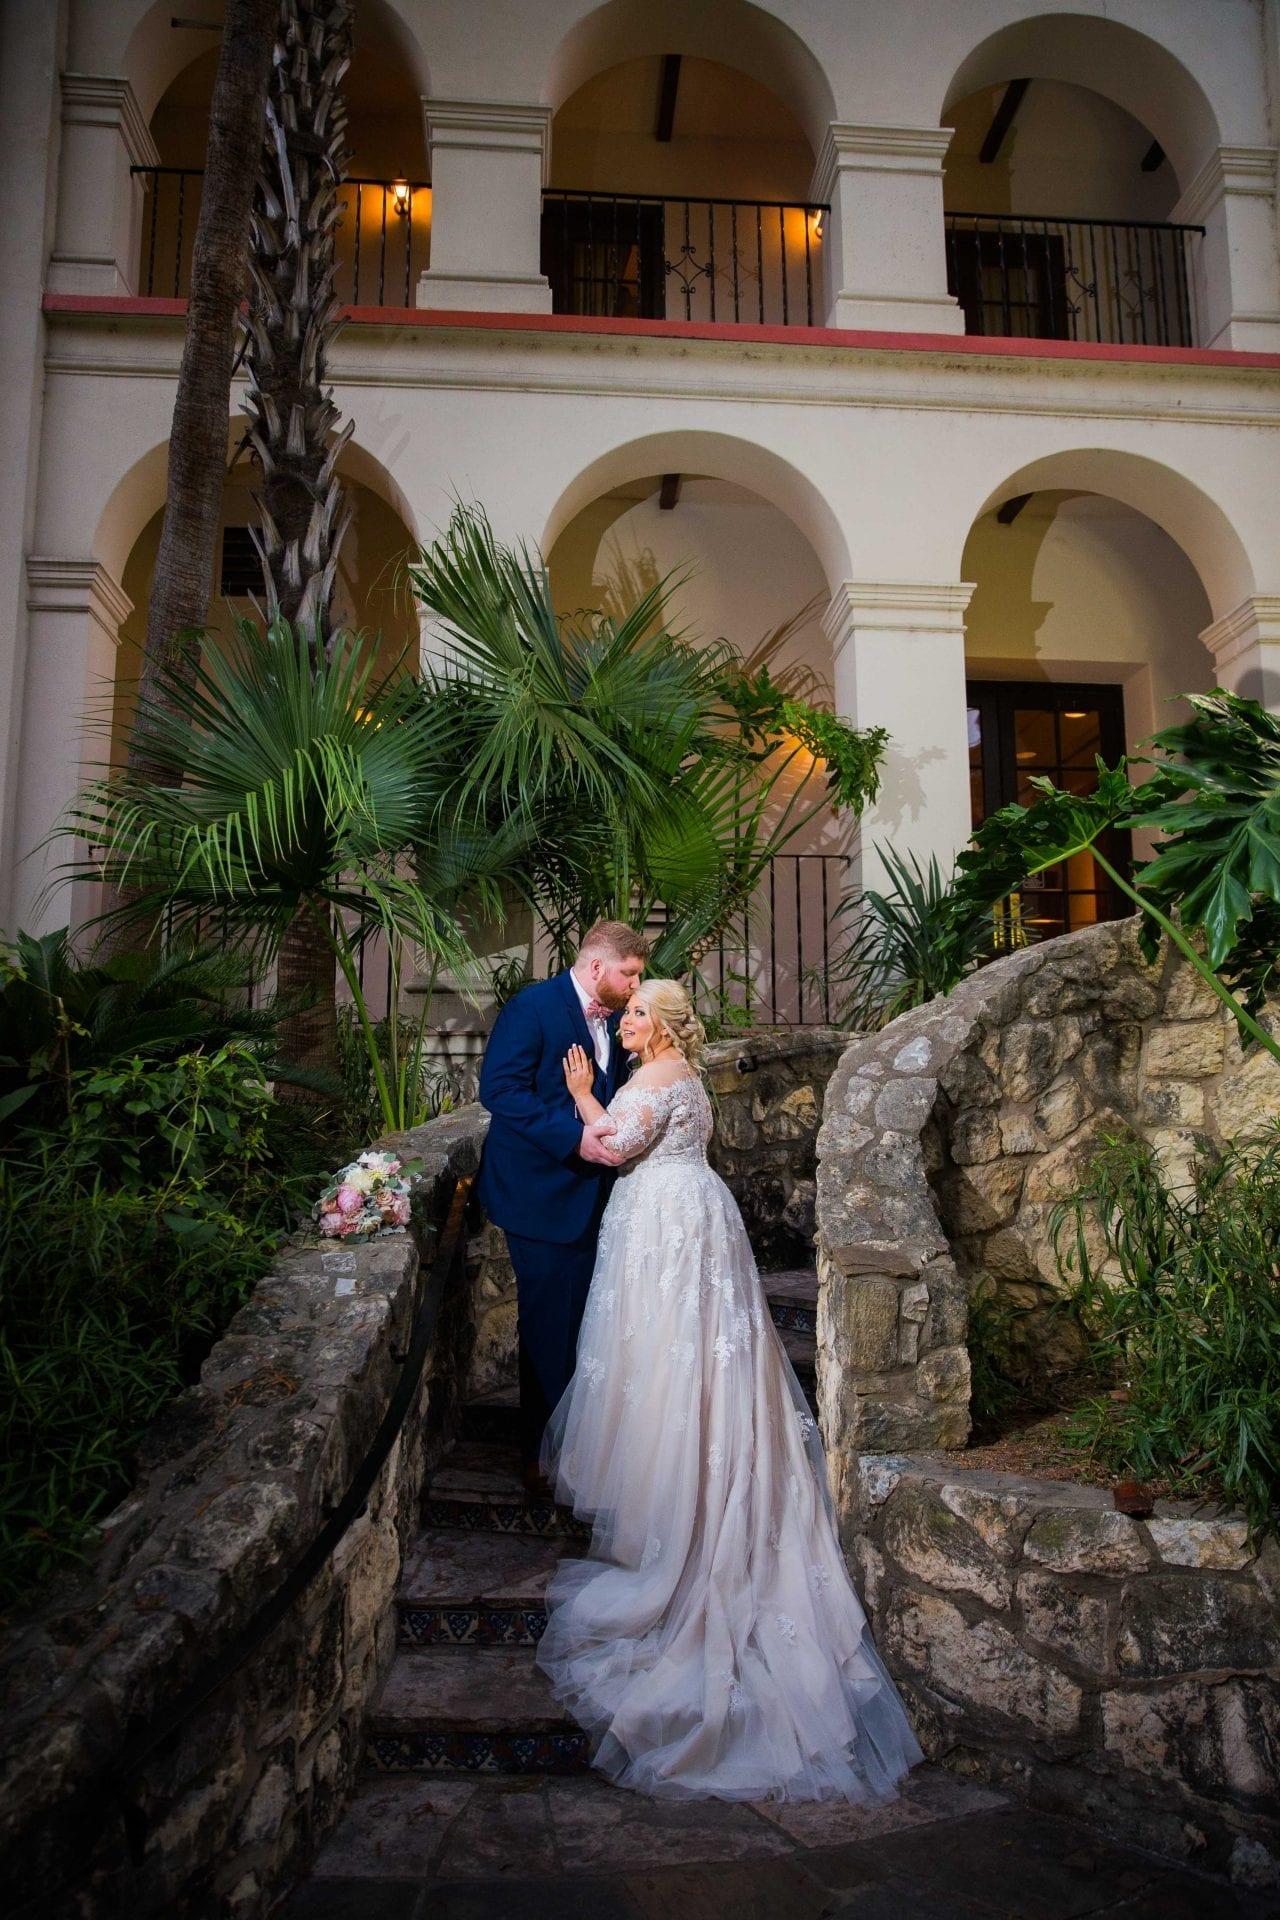 Crawford wedding Omni Del Mansion riverwalk portrait outside staircase